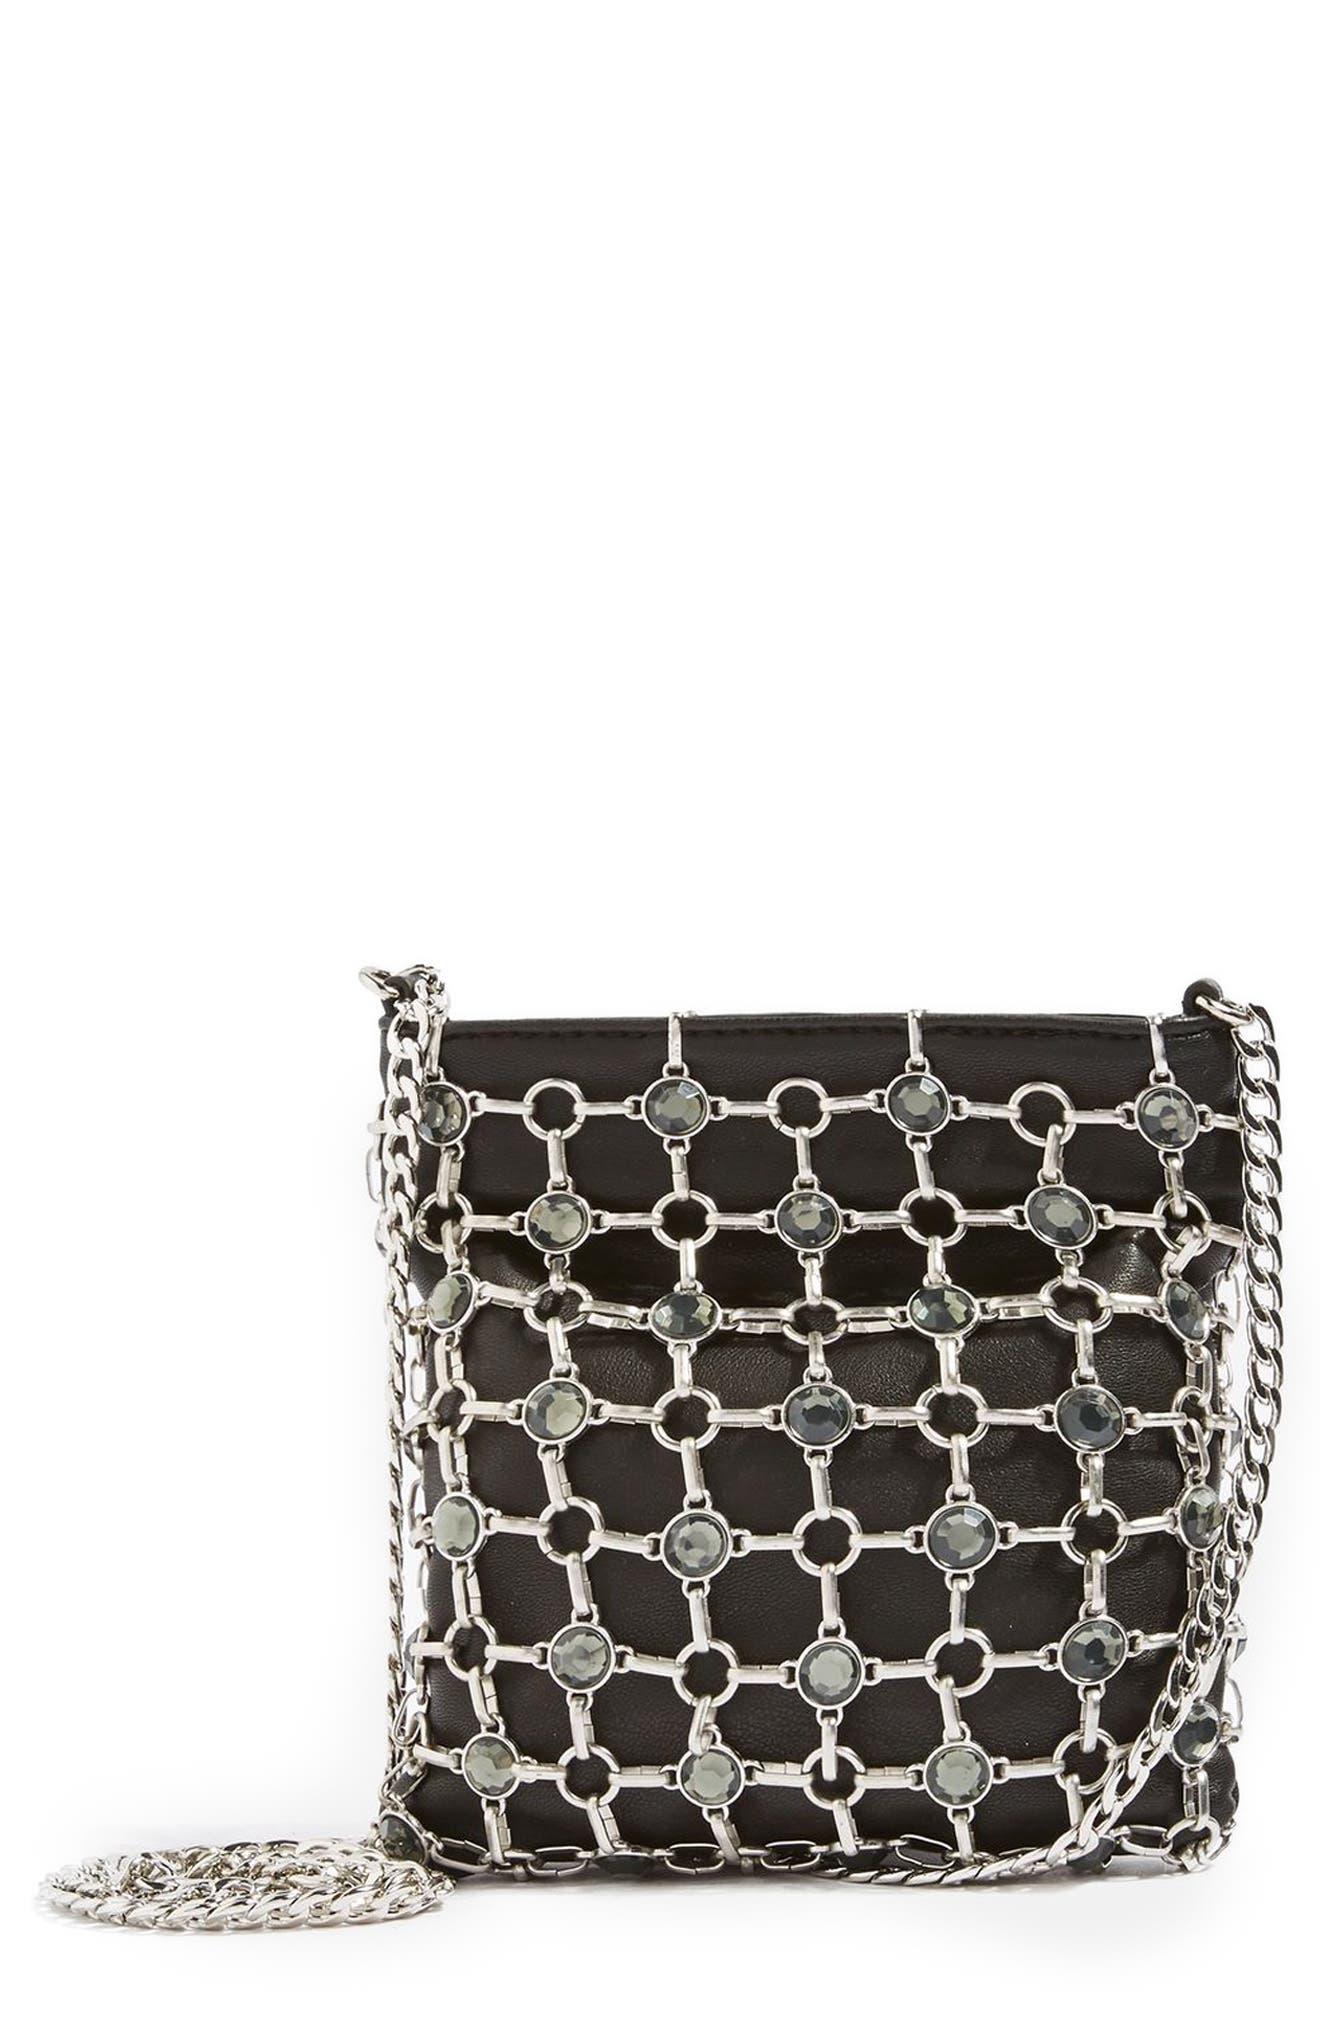 Topshop Chain Link Crossbody Bag